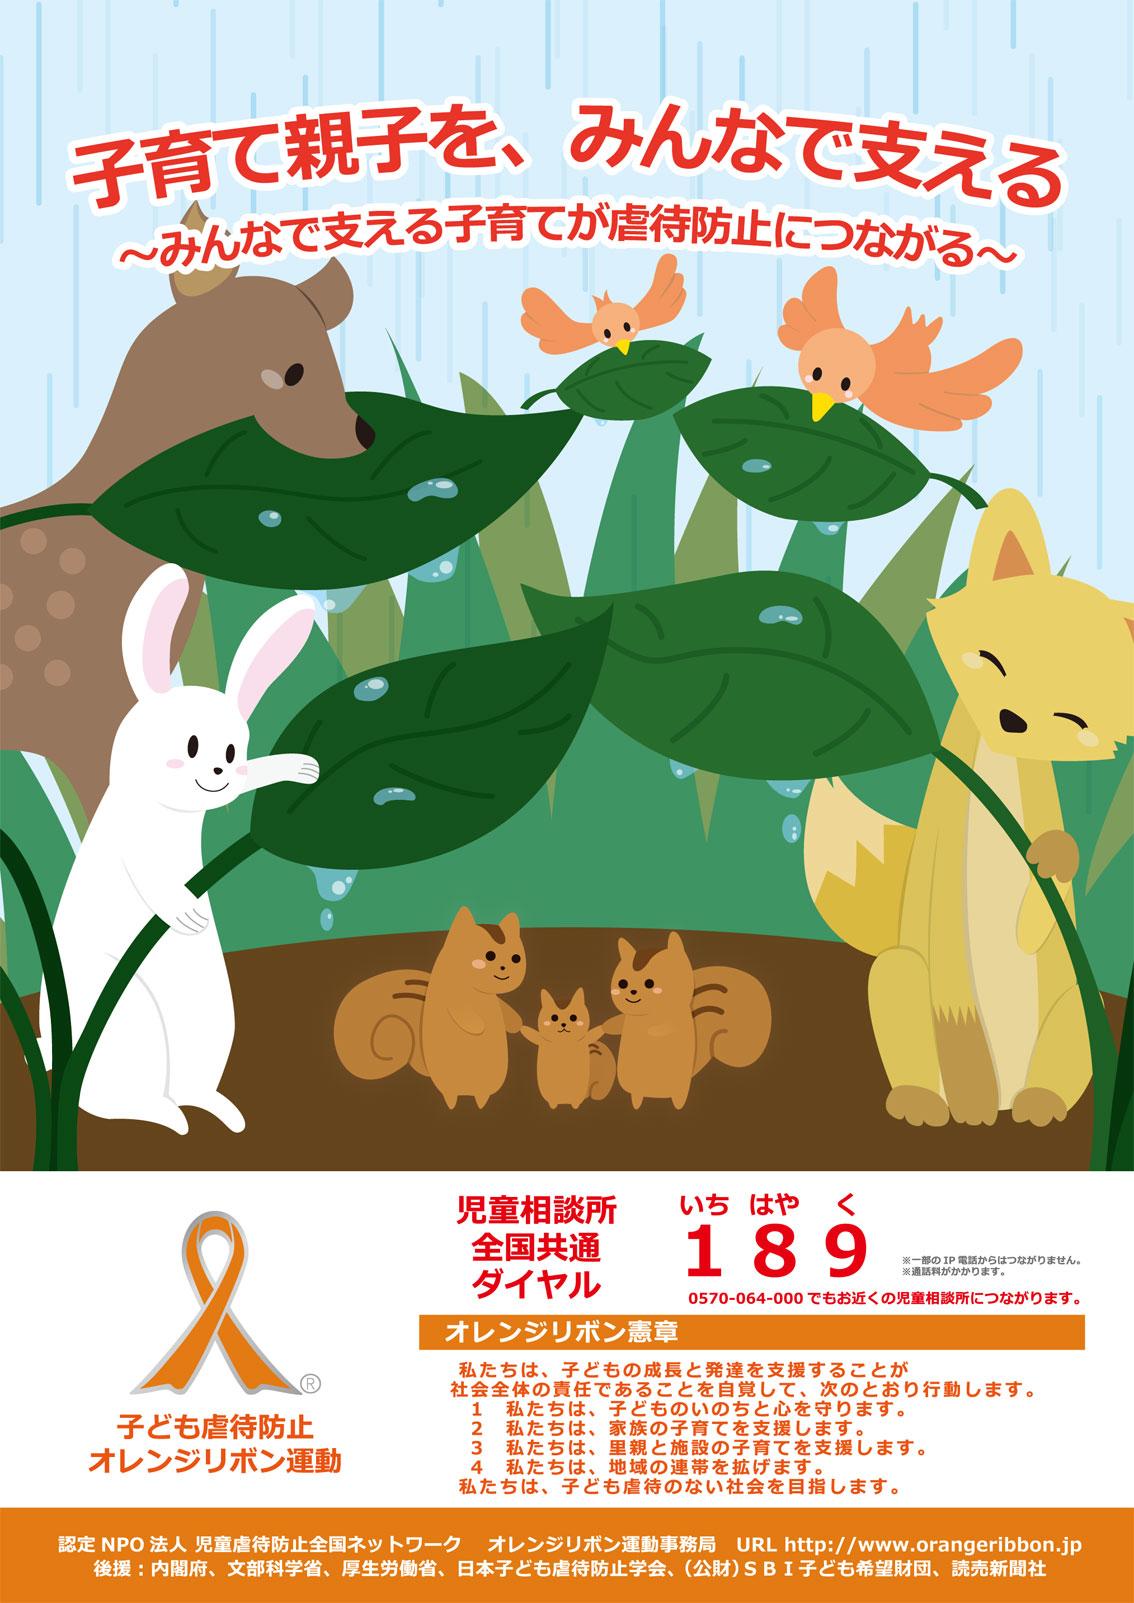 http://www.orangeribbon.jp/info/npo/contest/image/2015contest_GS.jpg